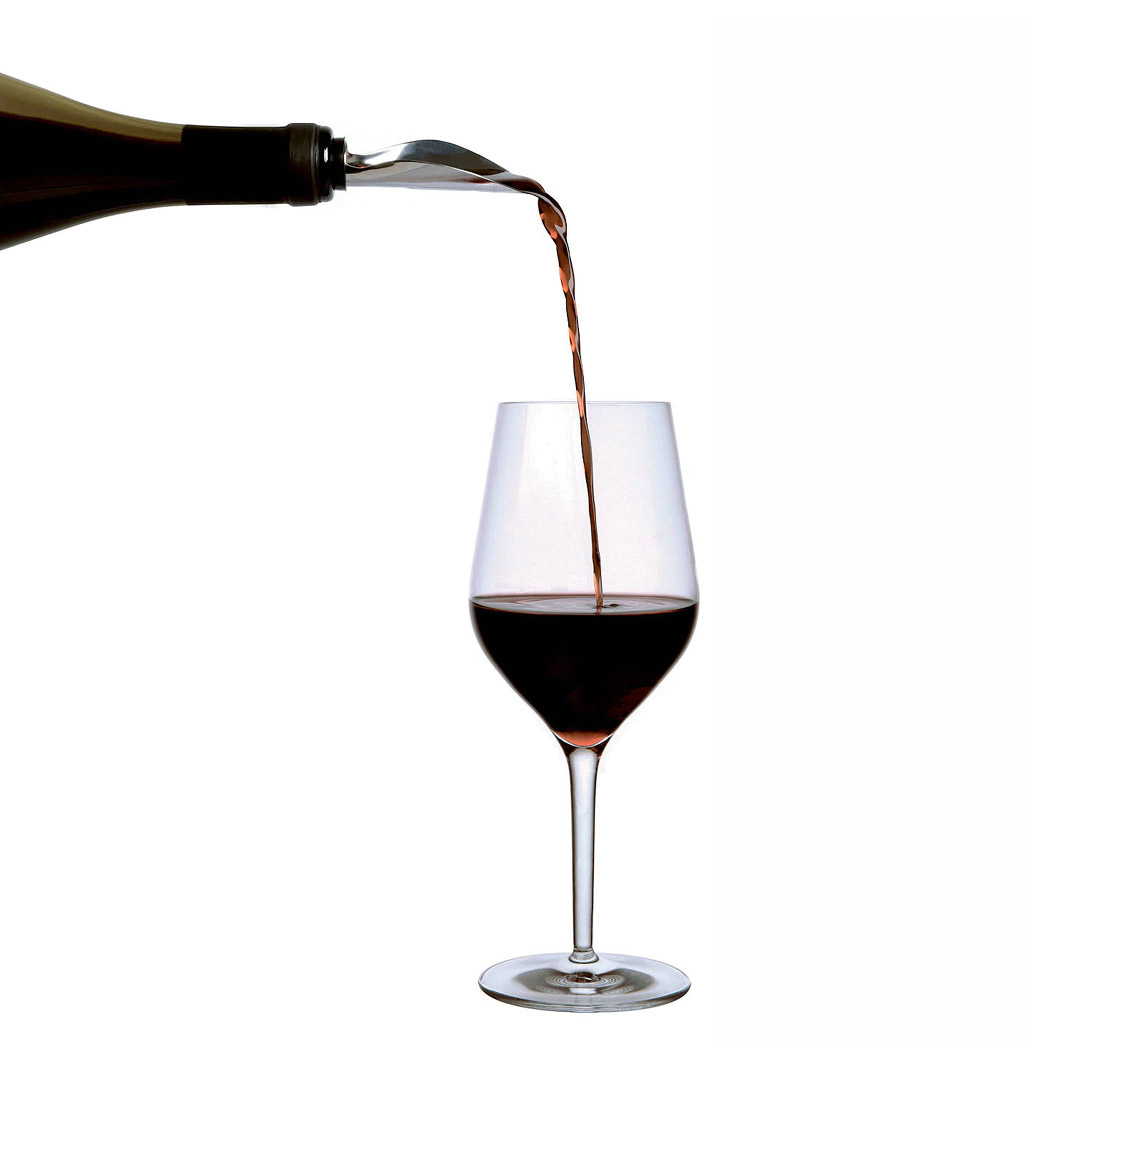 L' Atelier Du Vin The Pourer Leaf Wine Pourer